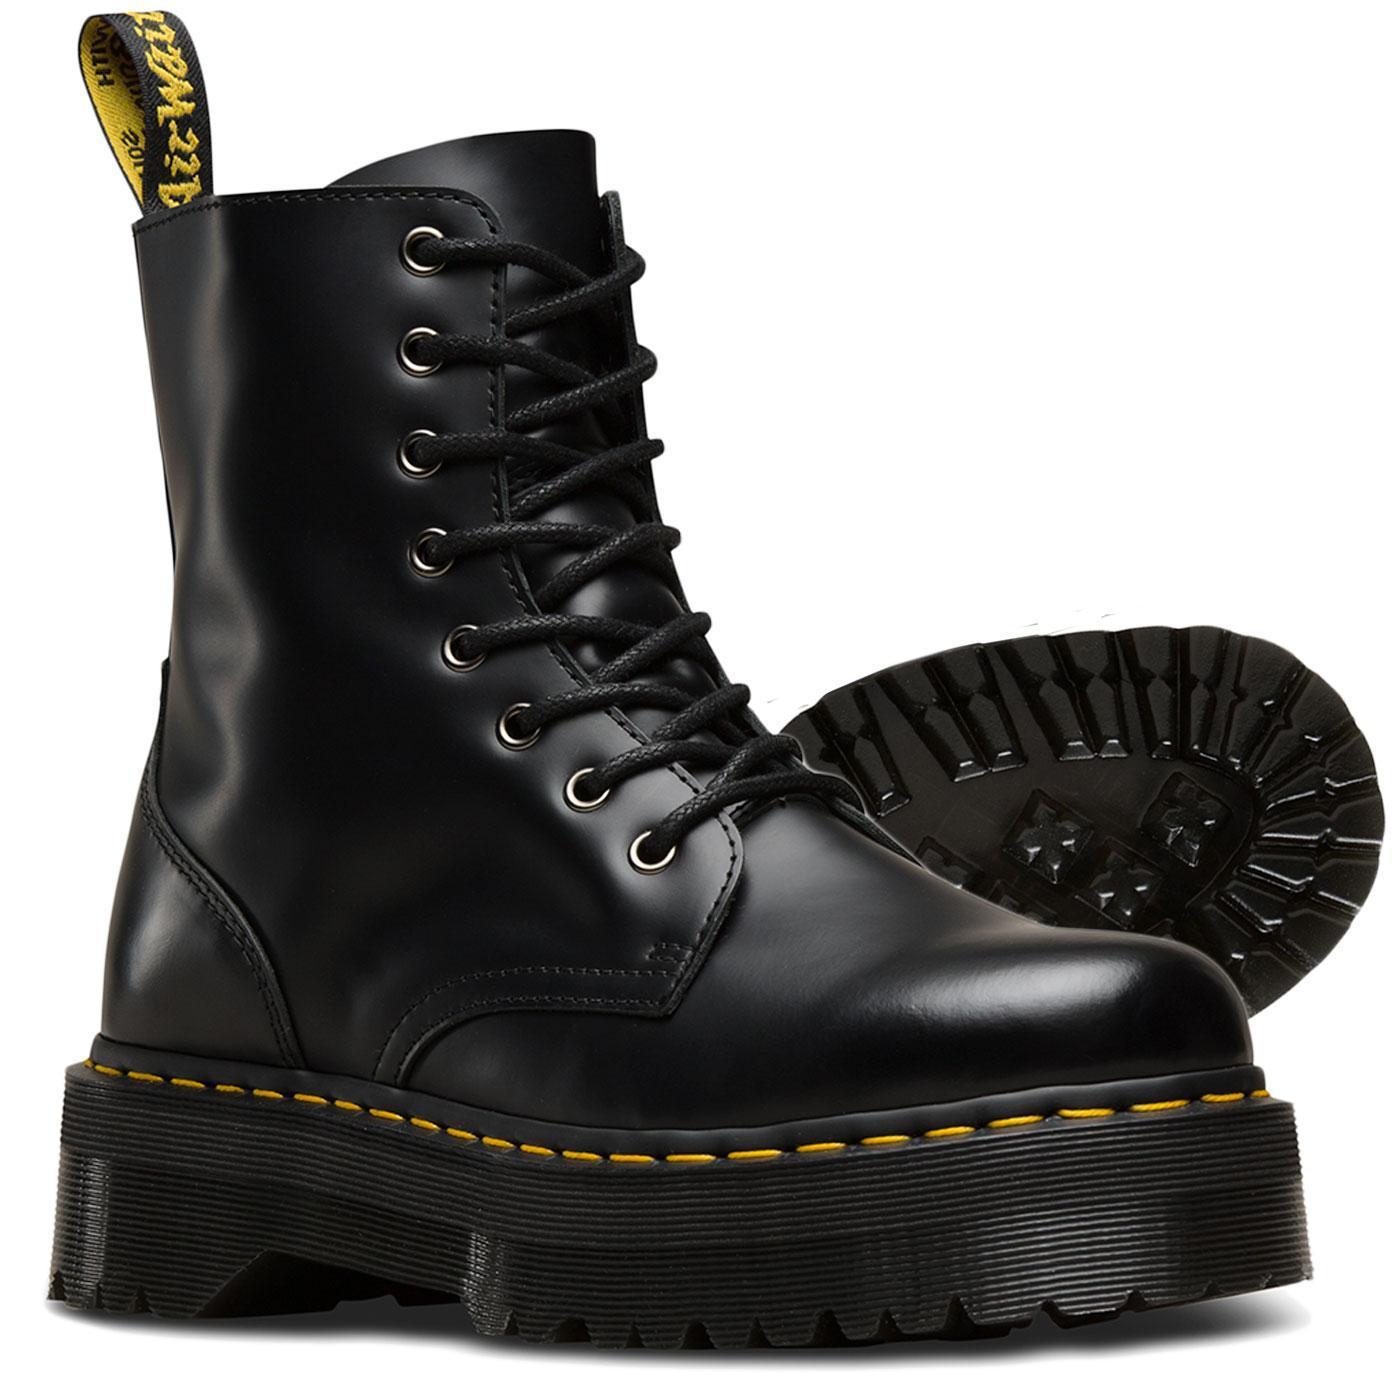 ca1134d84e2b DR MARTENS 'Jadon' Women's Punk Platform Boots in Black